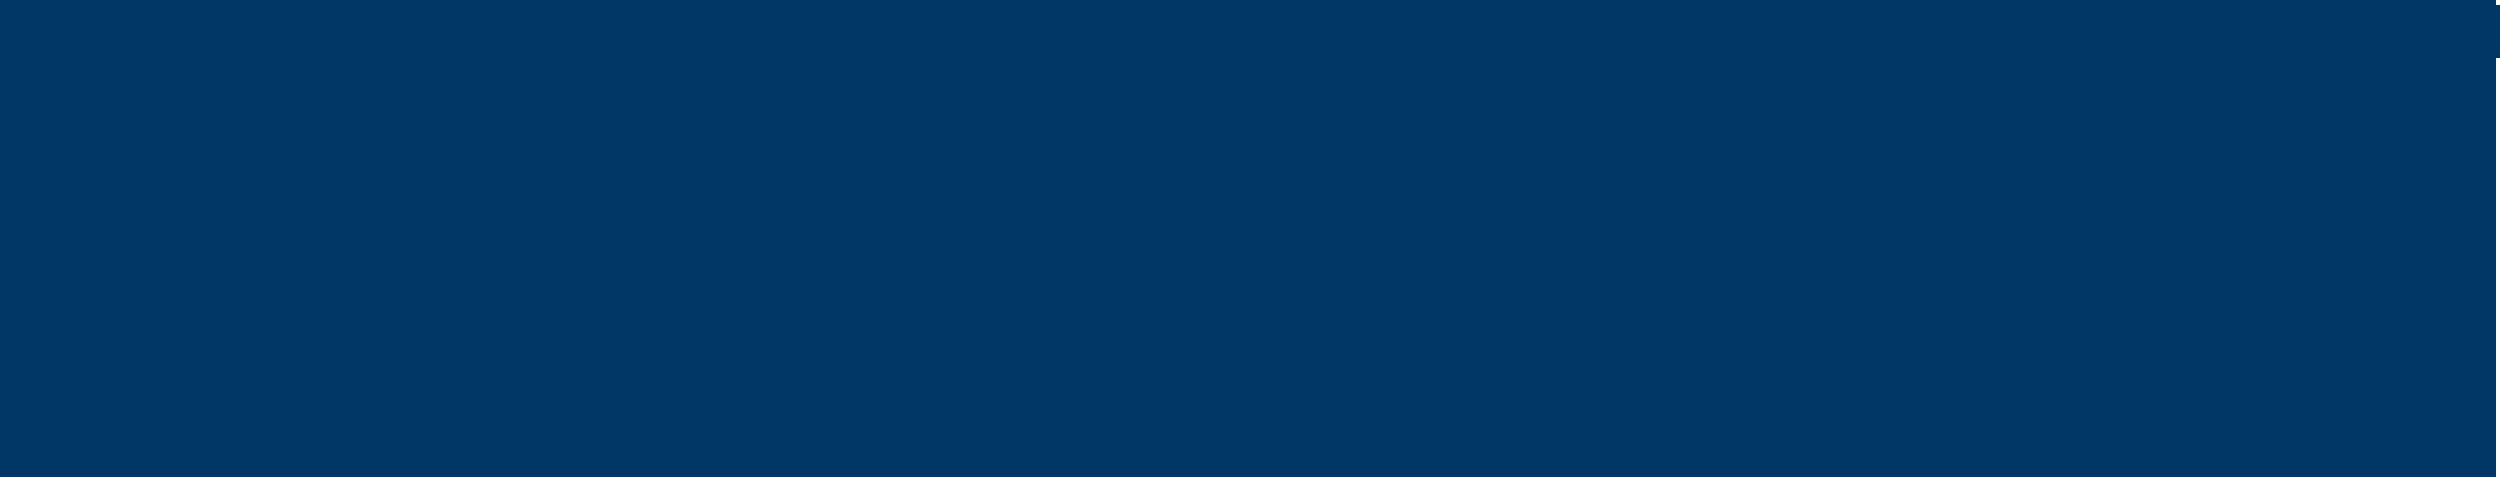 KIMCO Realty Corp.